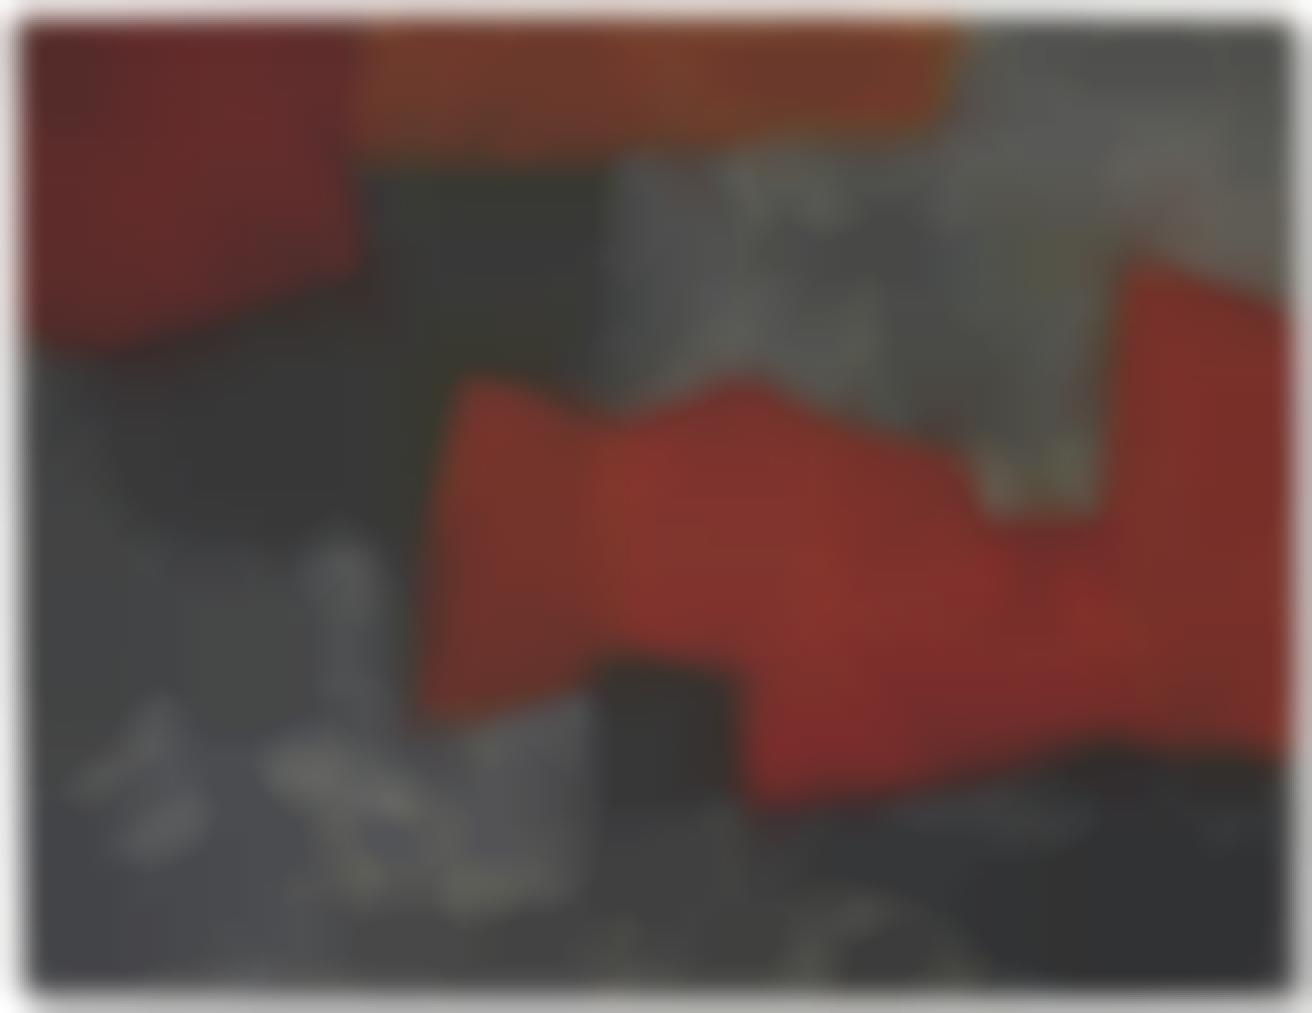 Serge Poliakoff-Composition Abstraite Gris, Orange Et Rouge-1964